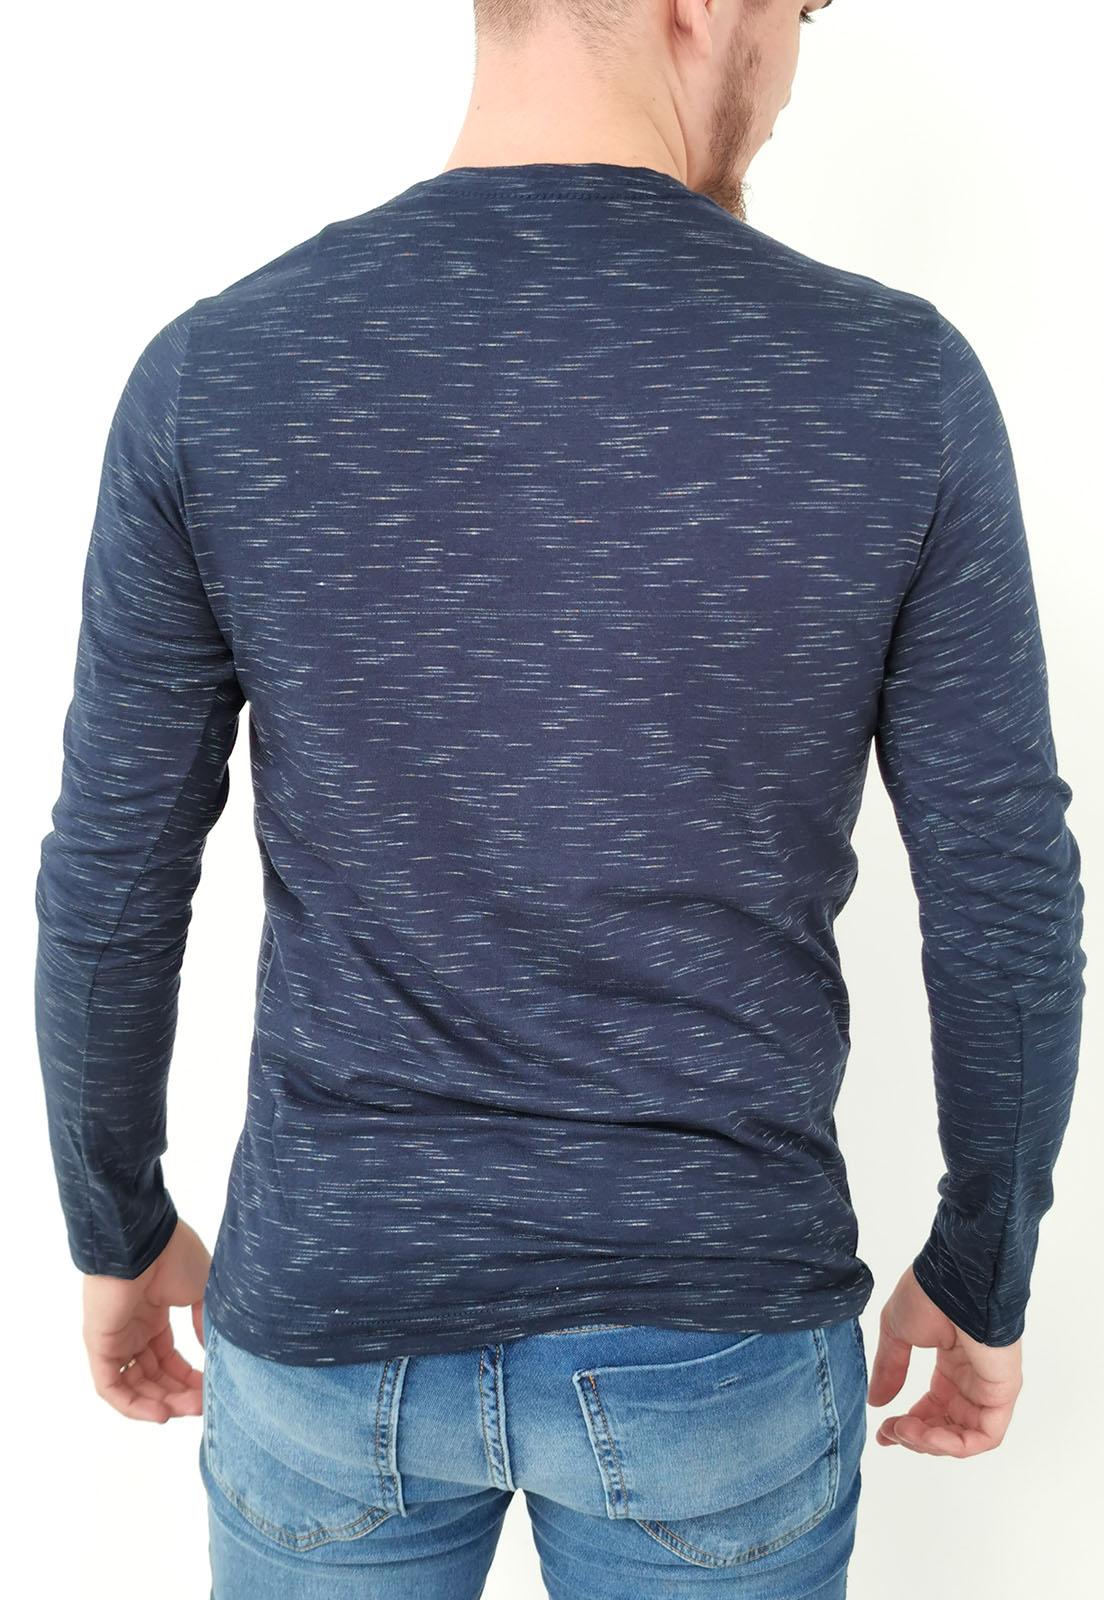 Camiseta Tigs Manga Longa Azul Marinho